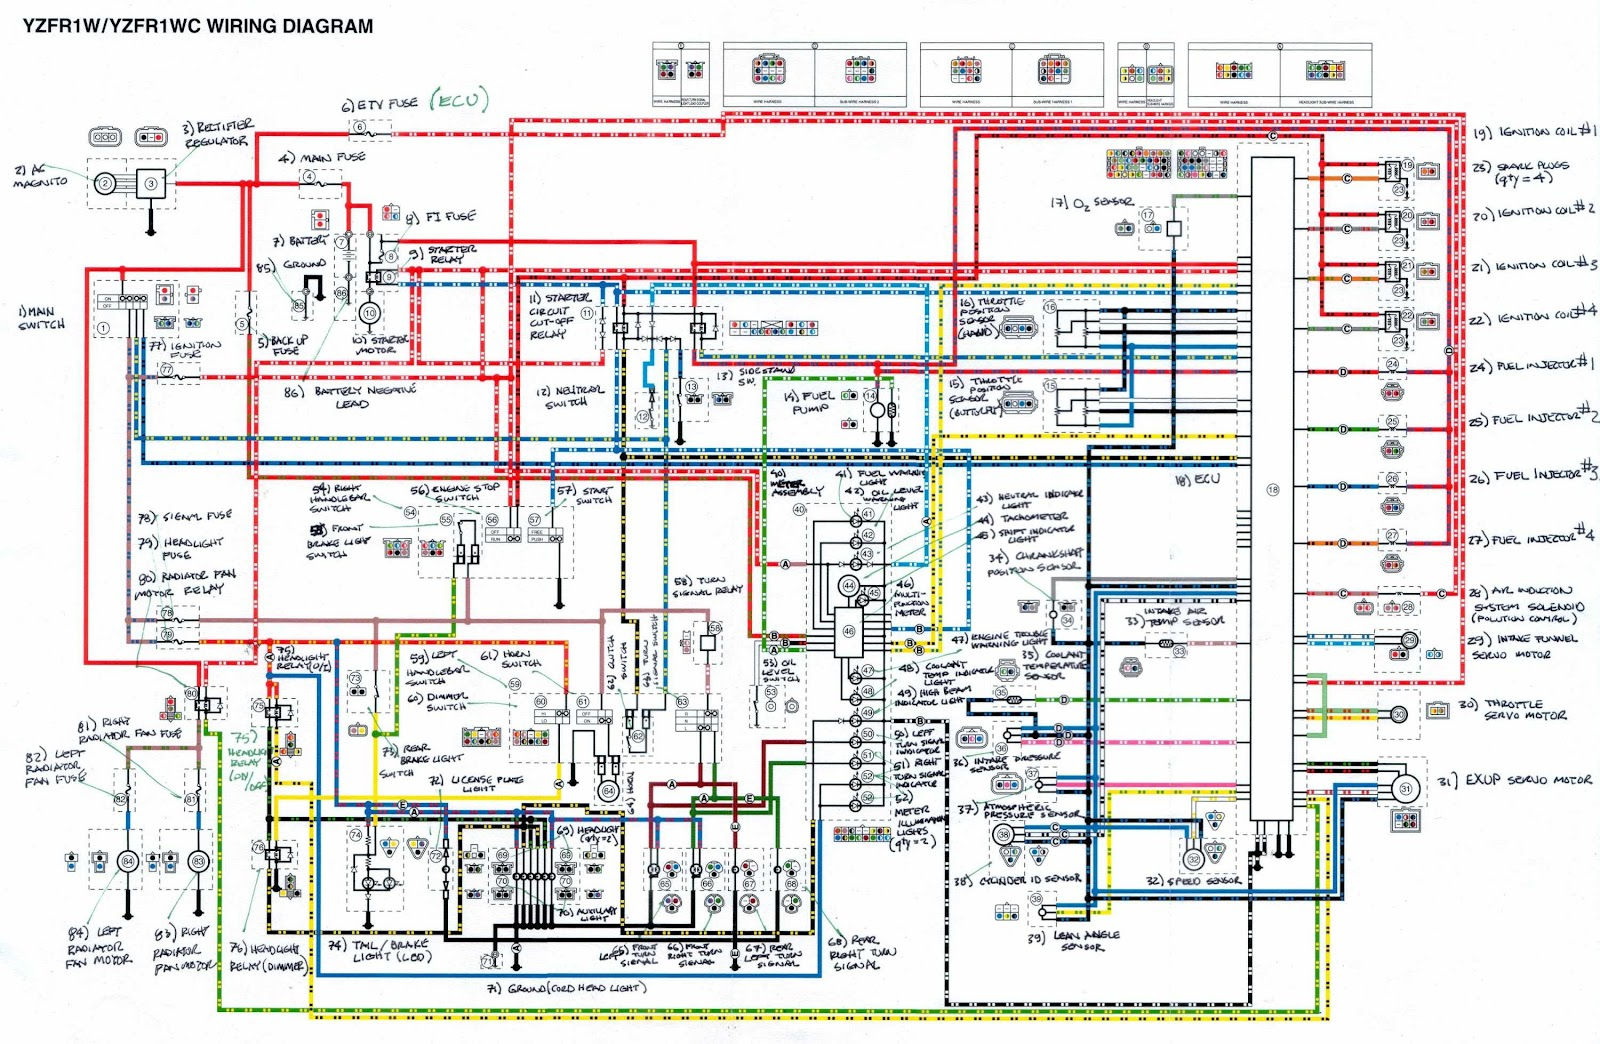 Yamaha+YZF R1+Motorcycle+Wiring+Diagram?resize\=665%2C434 2001 yamaha warrior wiring diagram 1989 yamaha xt 350 wire diagram 2000 yamaha warrior wiring diagram at crackthecode.co